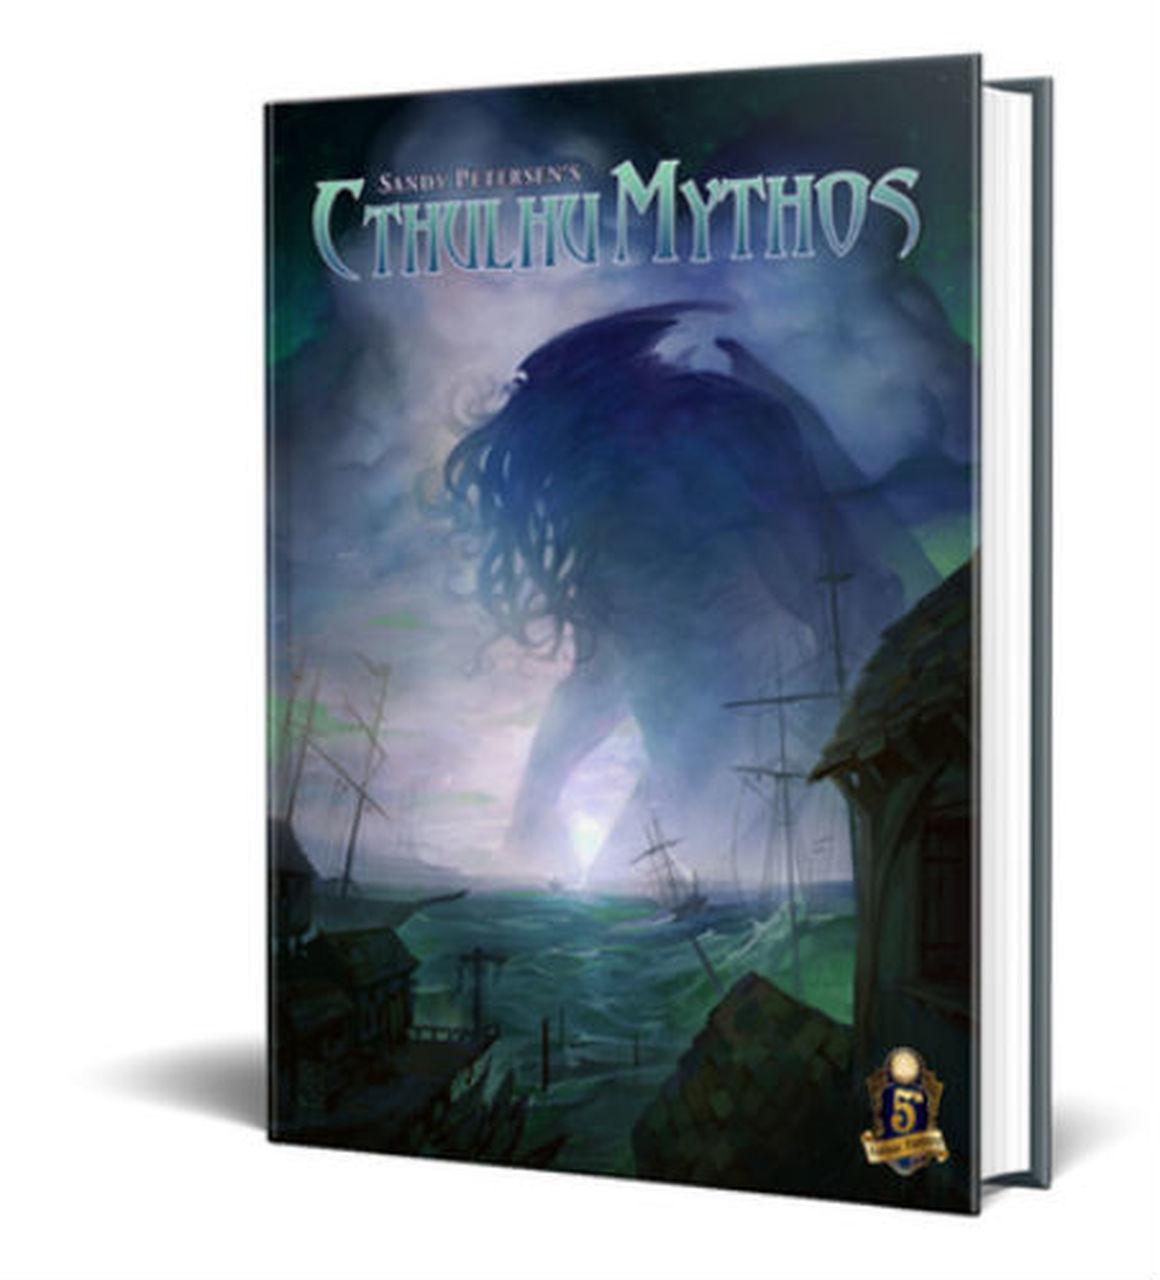 Sandy Petersen's Cthulhu Mythos in 5E image